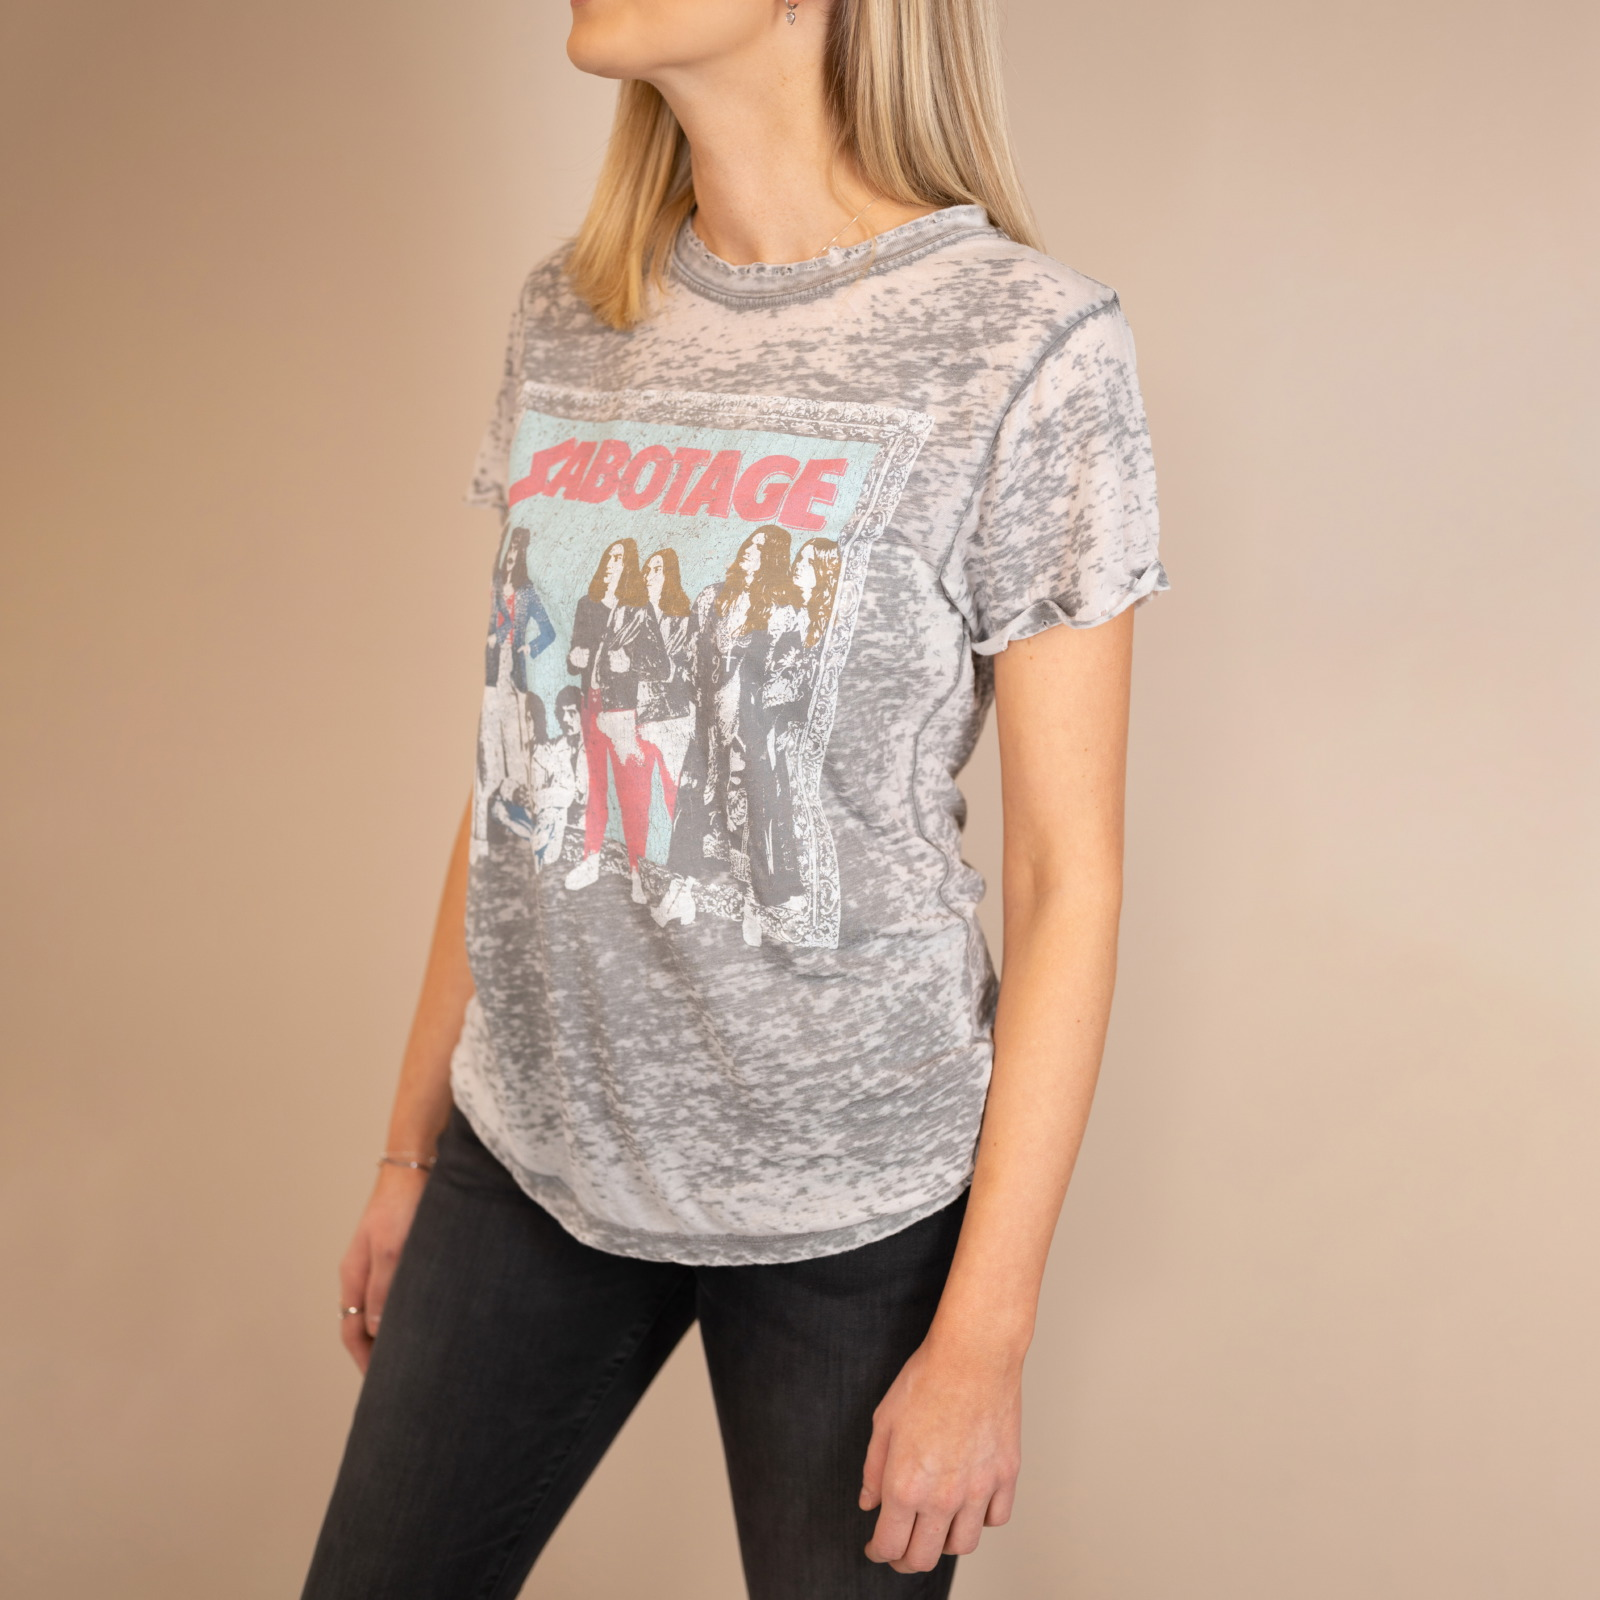 RECYCLED KARMA T-Shirt Sabotage